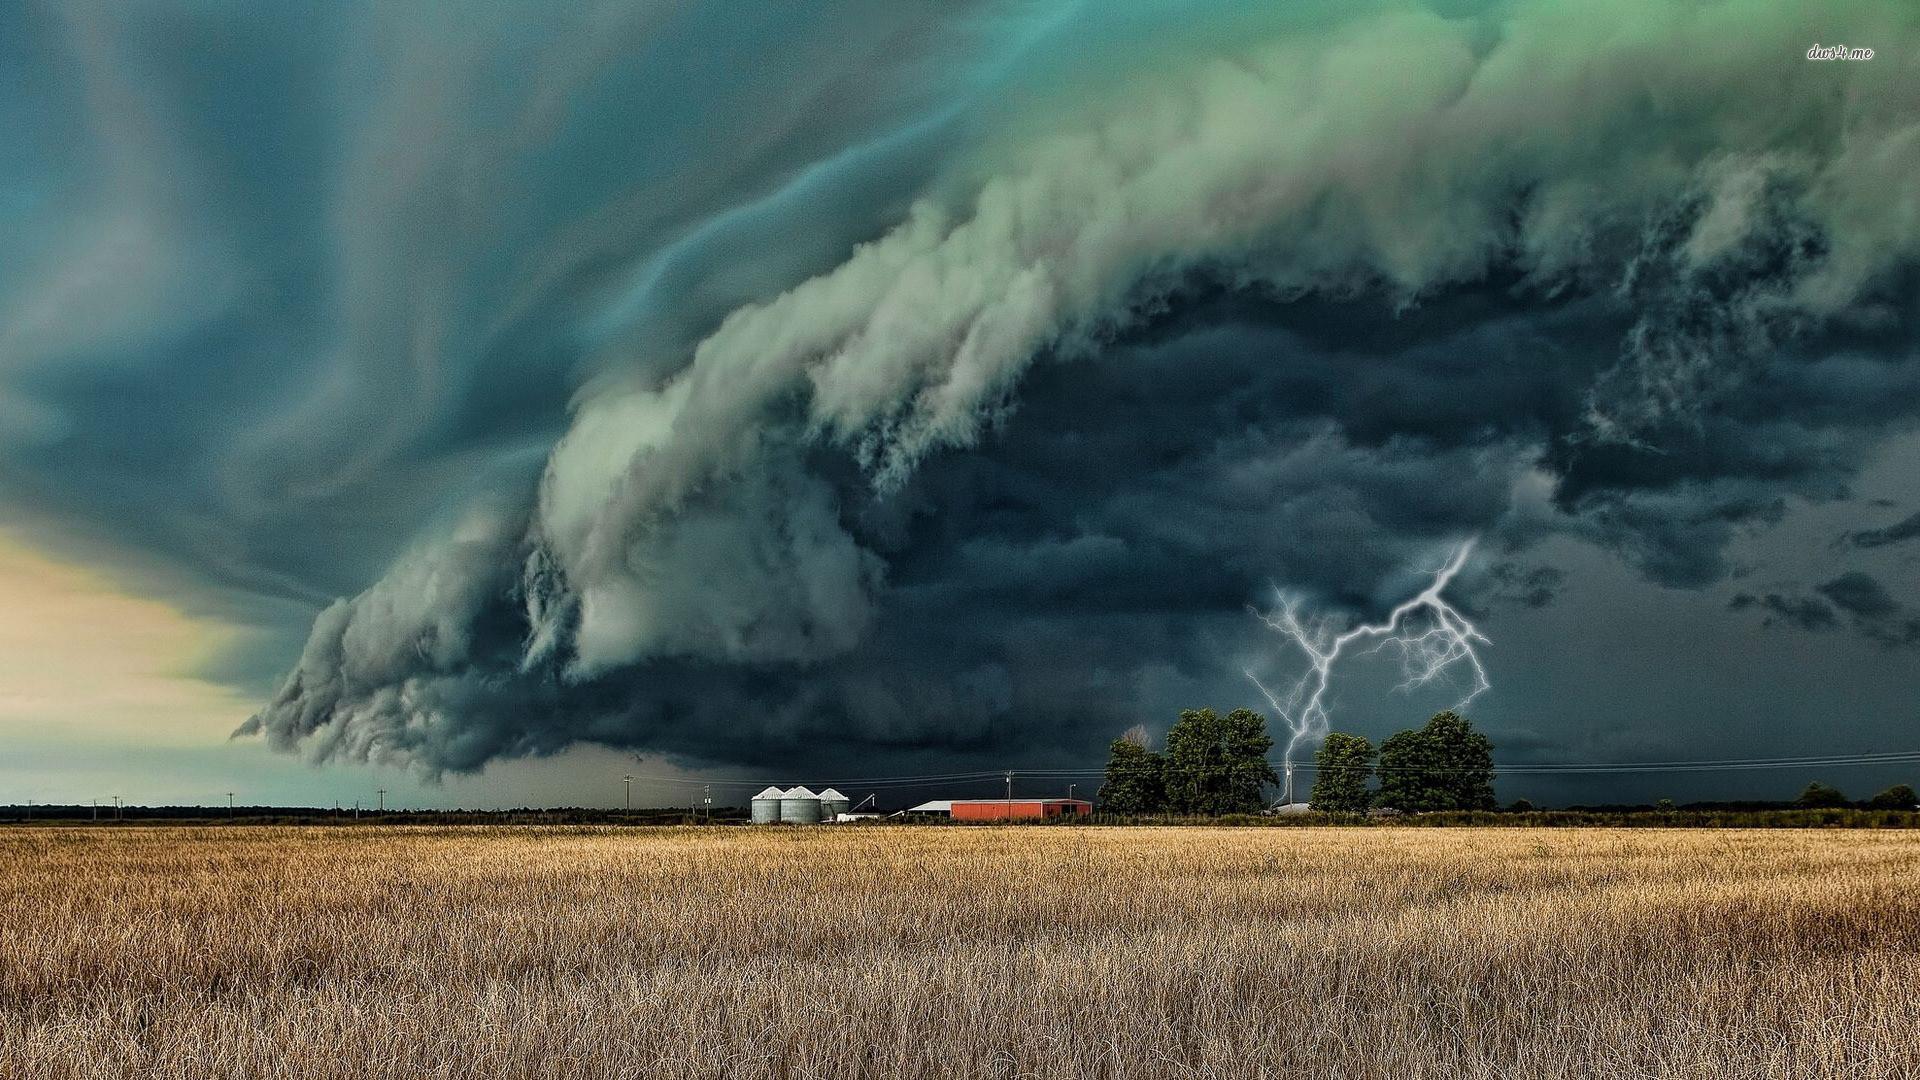 Storm Cloud Desktop Wallpaper 49 images 1920x1080